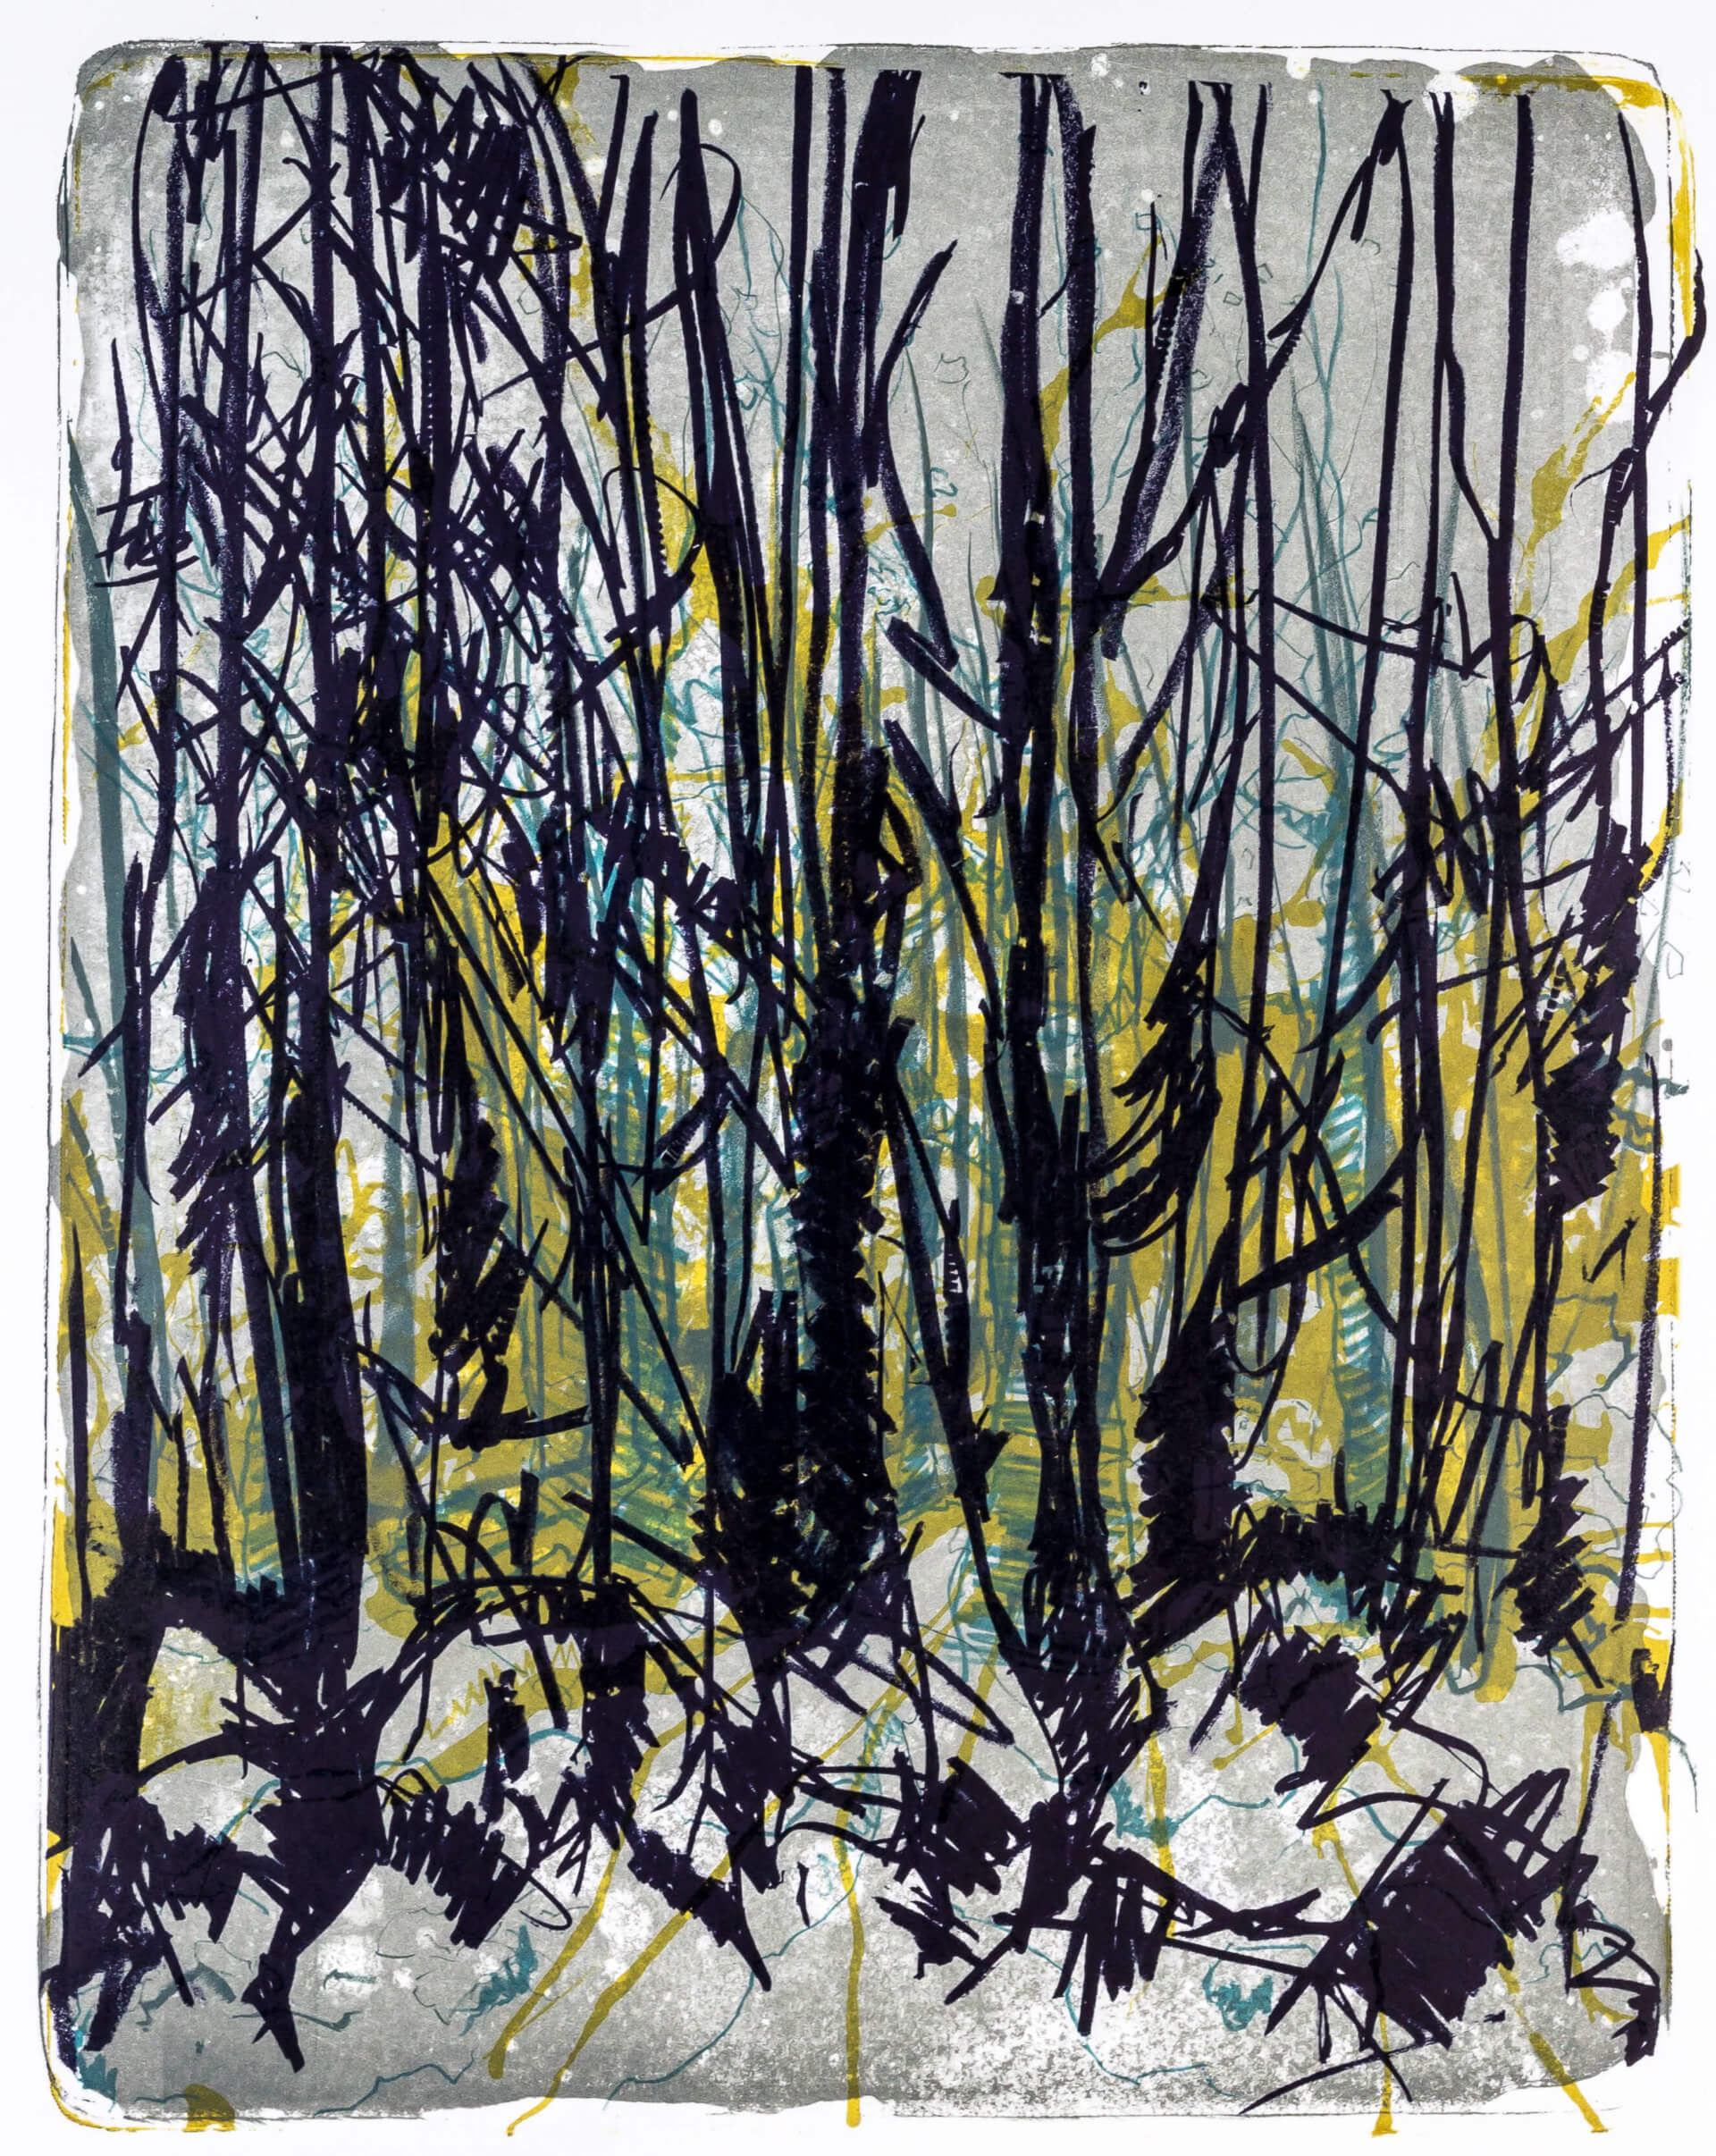 Katharina Albers, Wald X-VIII, 2015, Farblithographie, Unikat, 50×40 cm